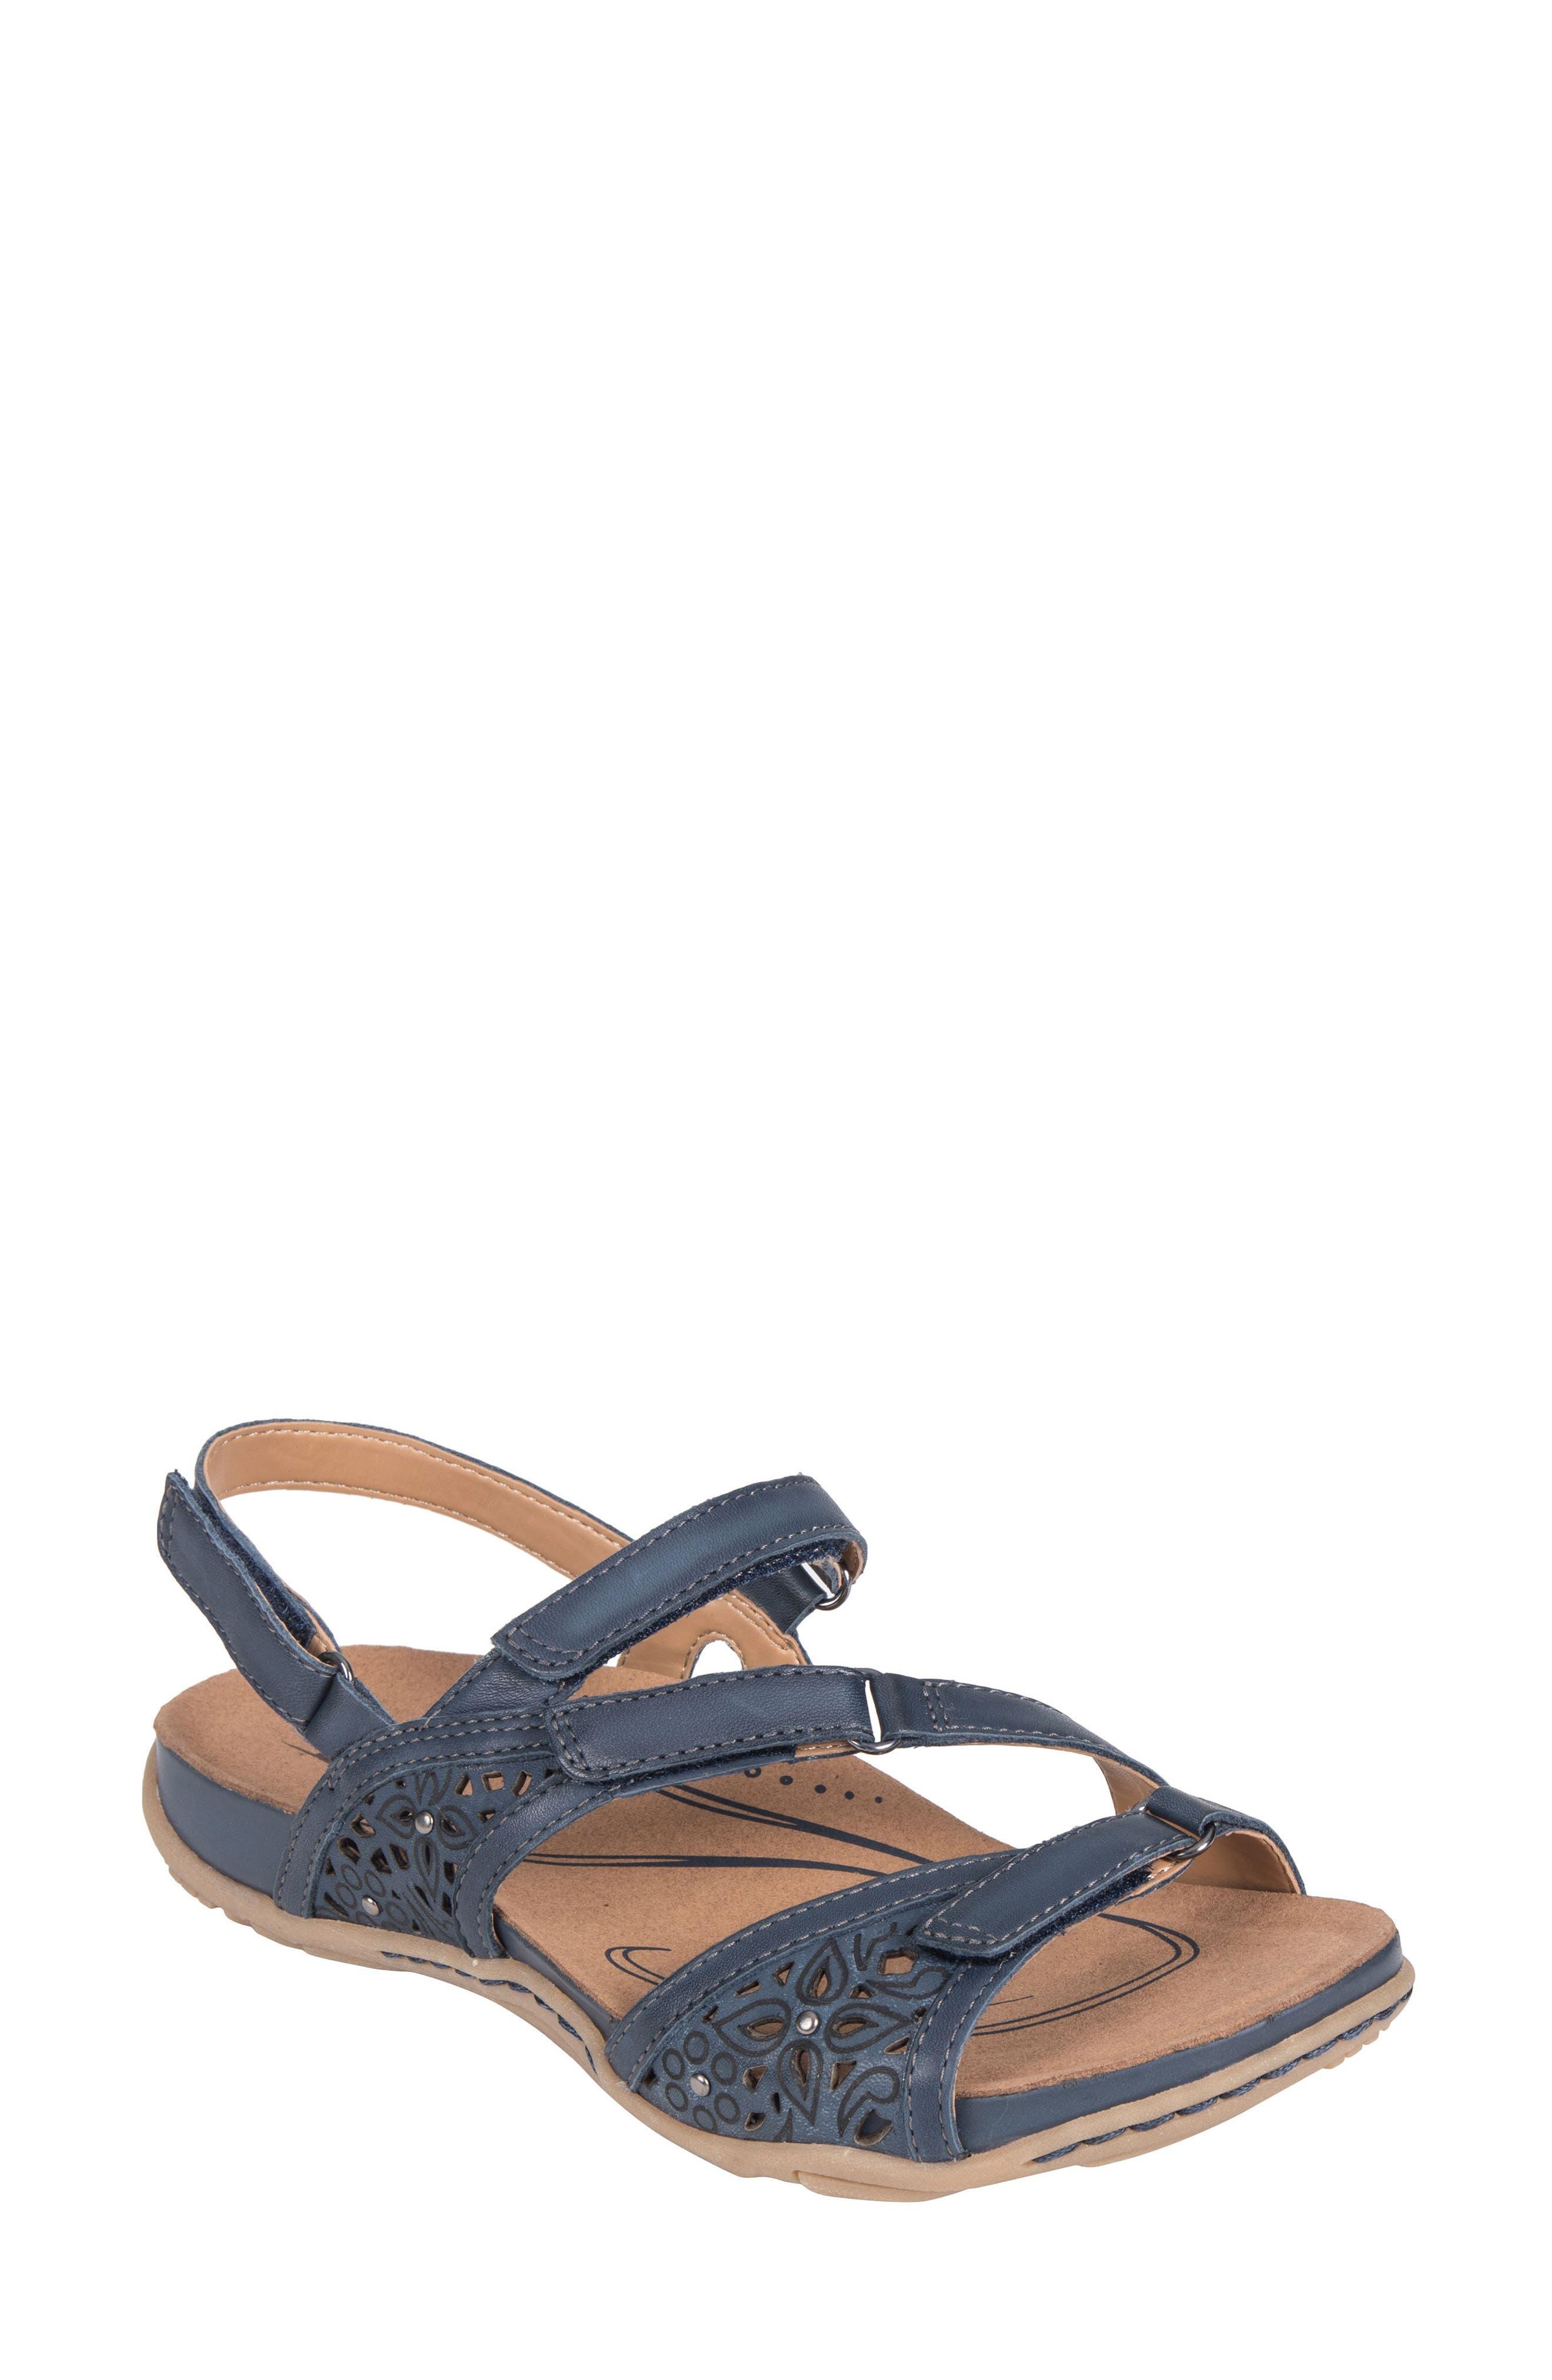 Maui Strappy Sandal,                             Main thumbnail 1, color,                             Indigo Blue Leather